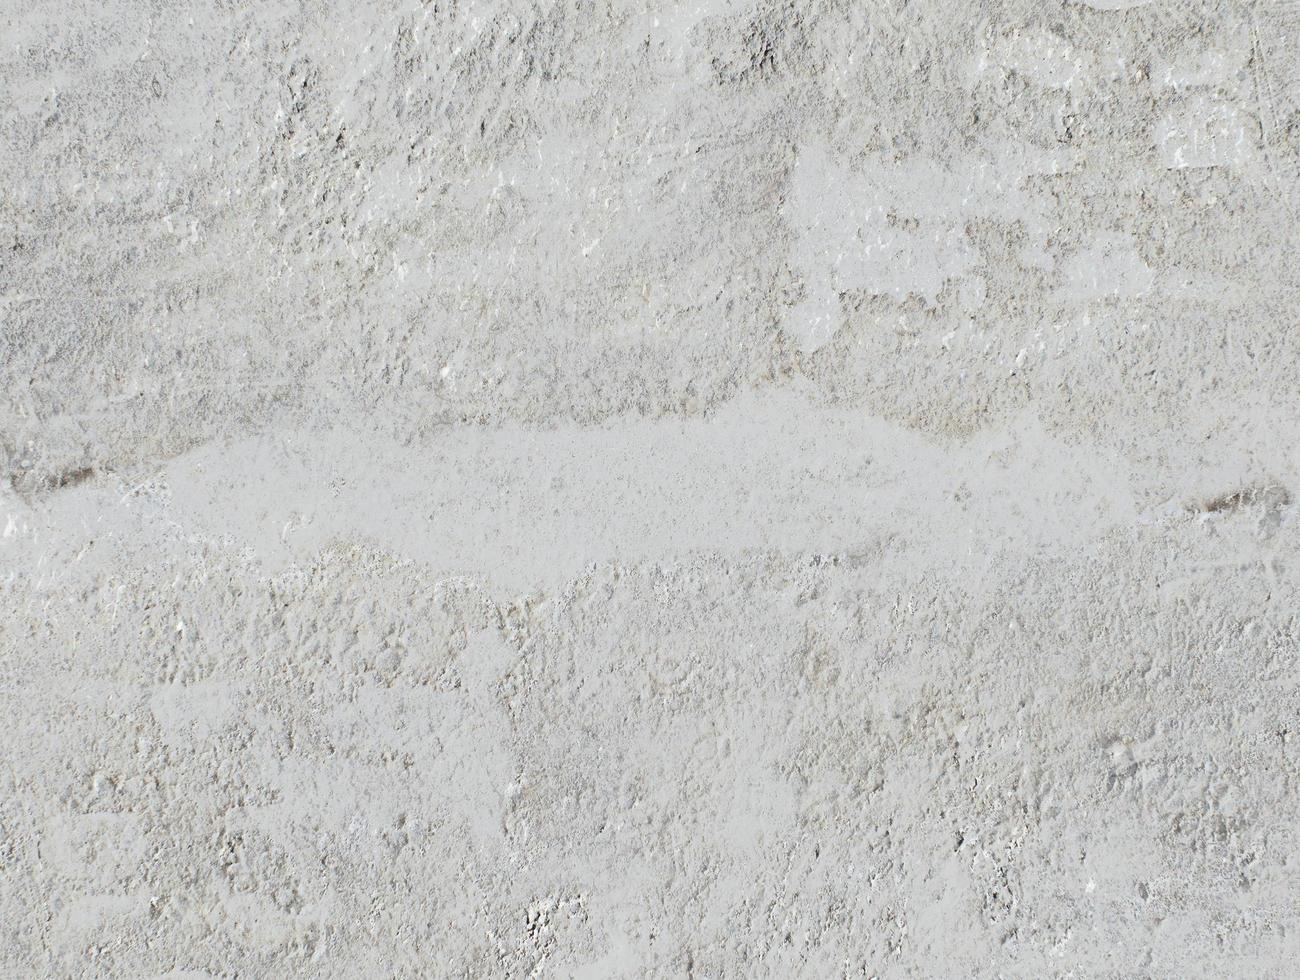 sfondo texture pietra neutra foto